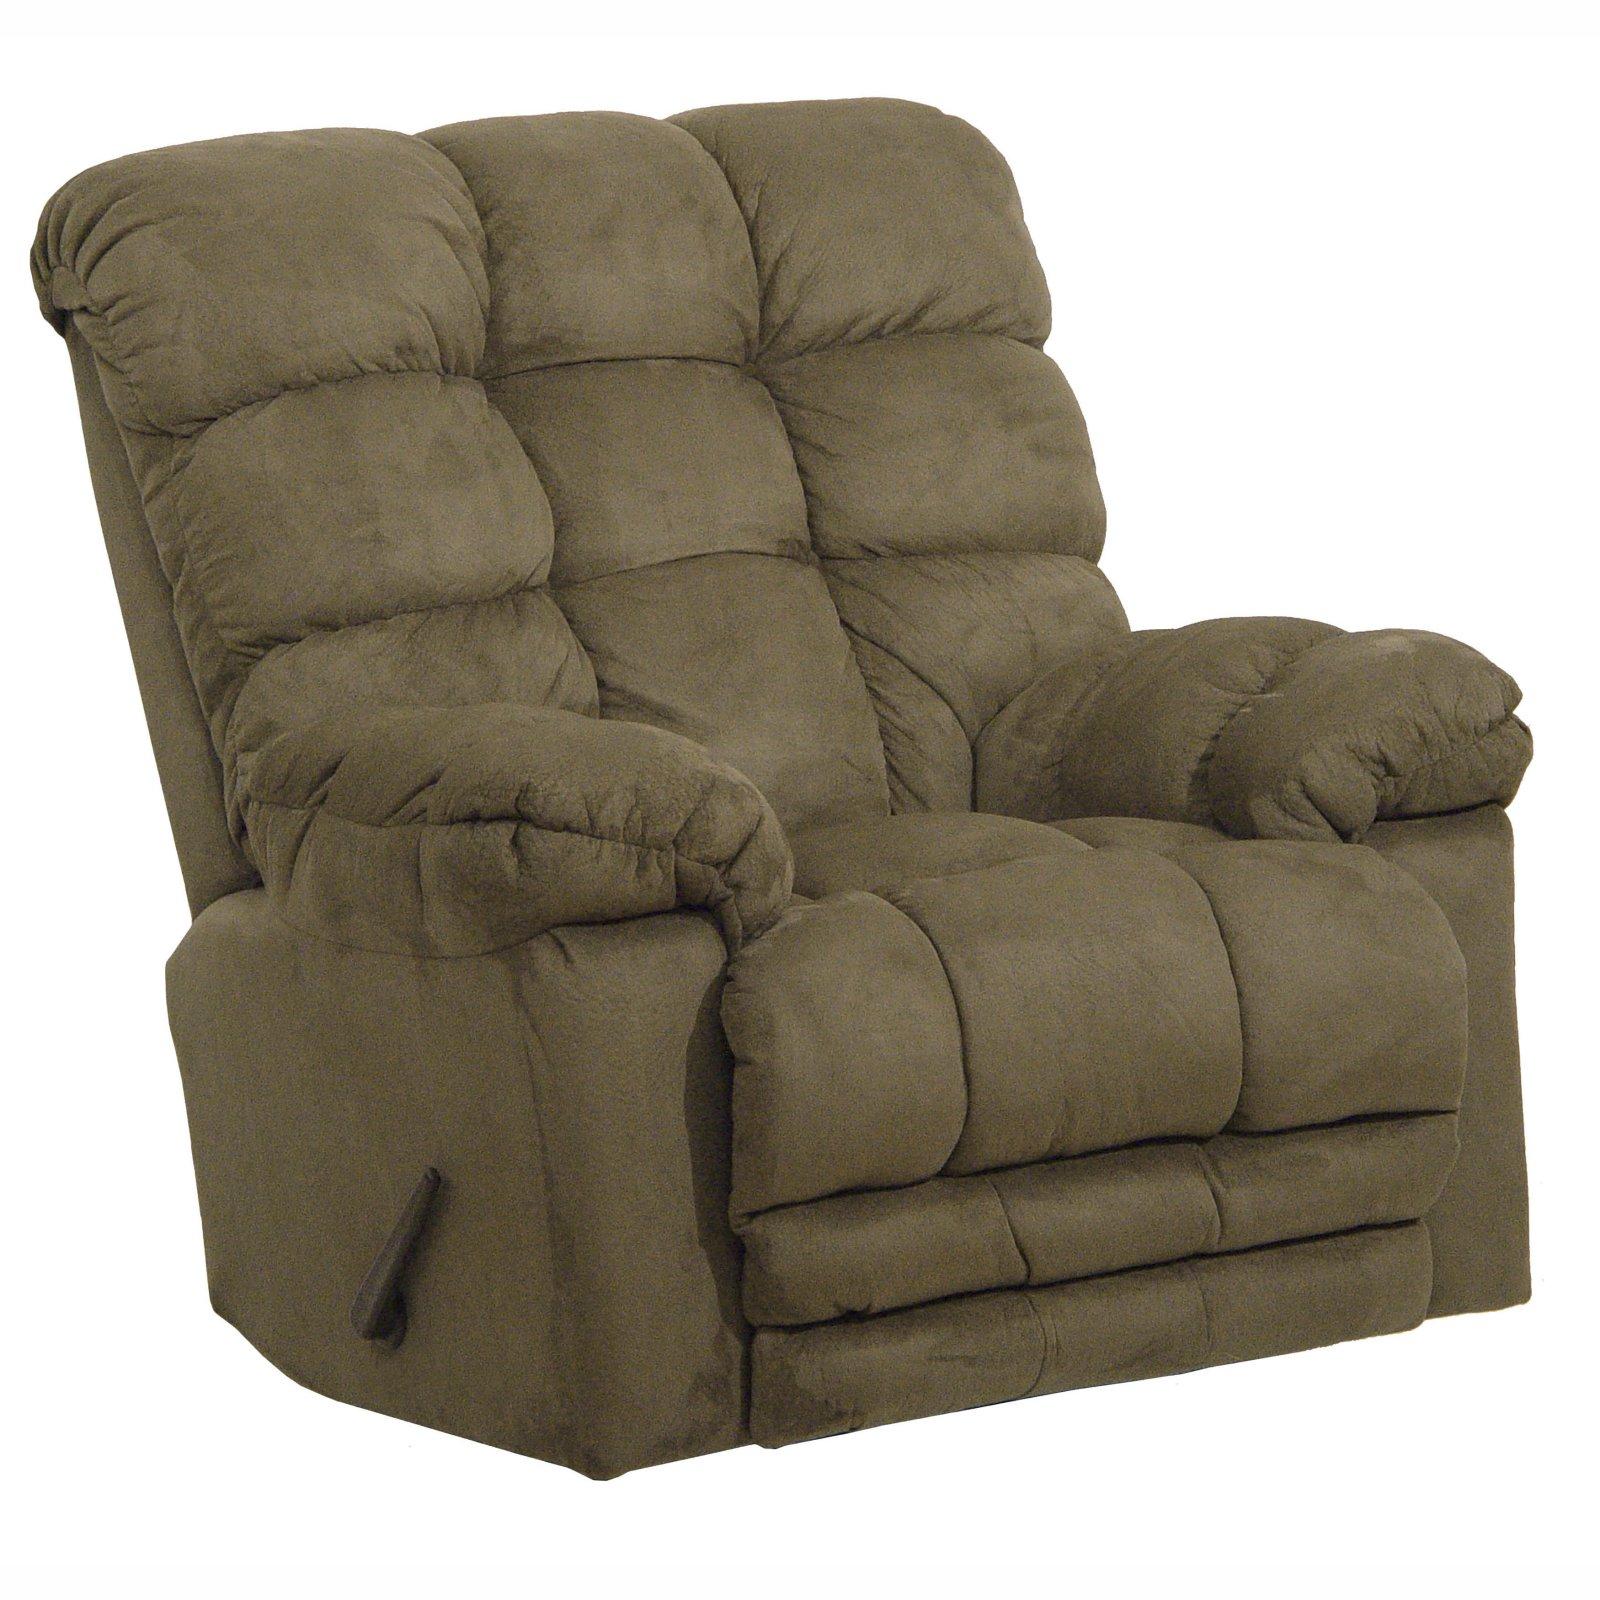 Superb Catnapper Deluxe Magnum Heat Massage Rocker Recliner In Dailytribune Chair Design For Home Dailytribuneorg